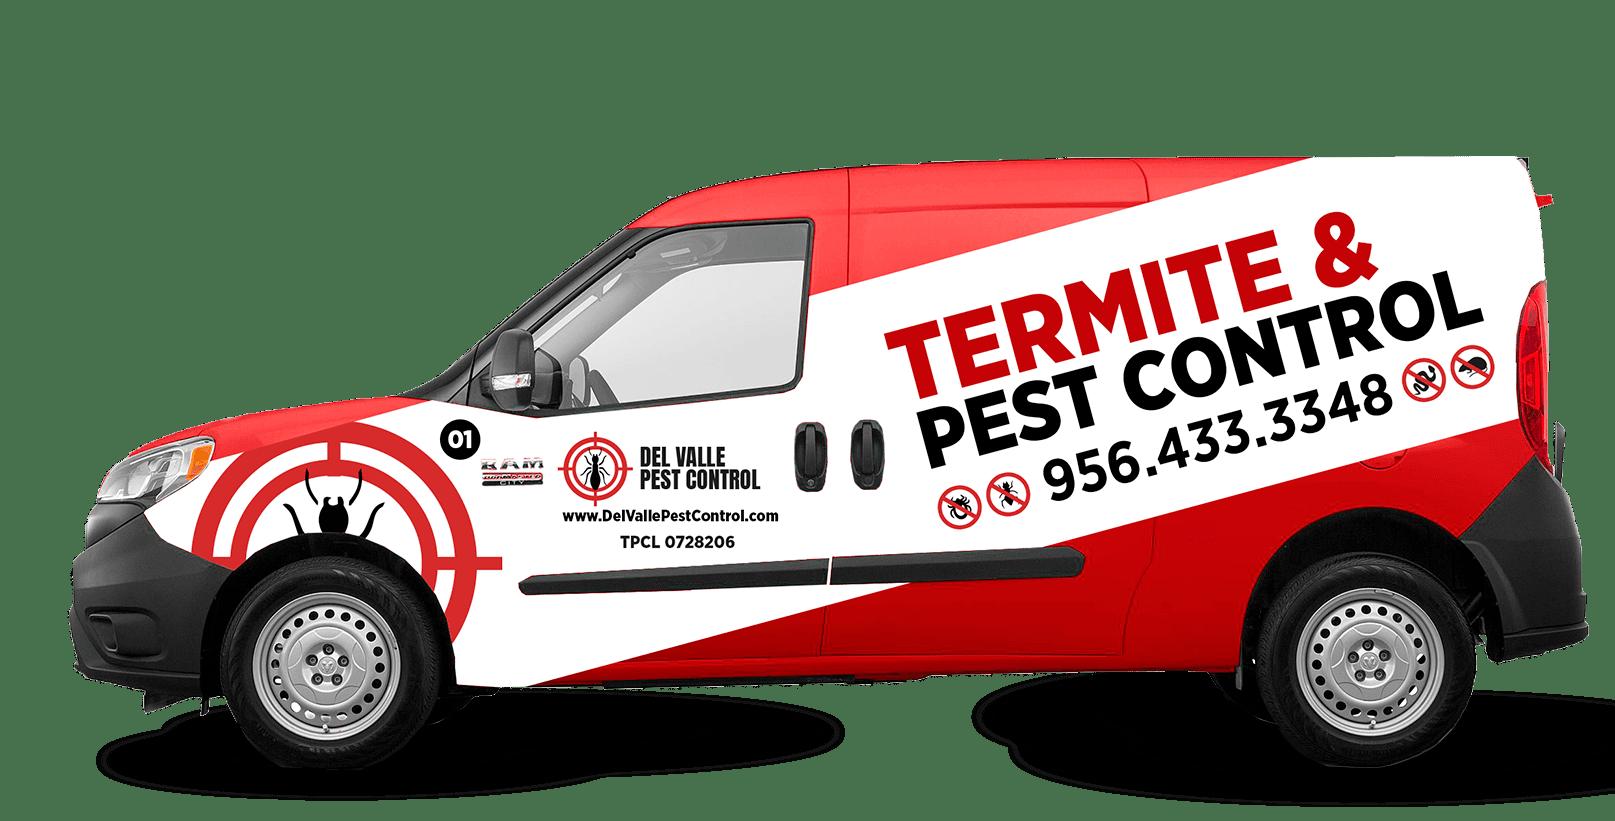 DelValle Pest Control van